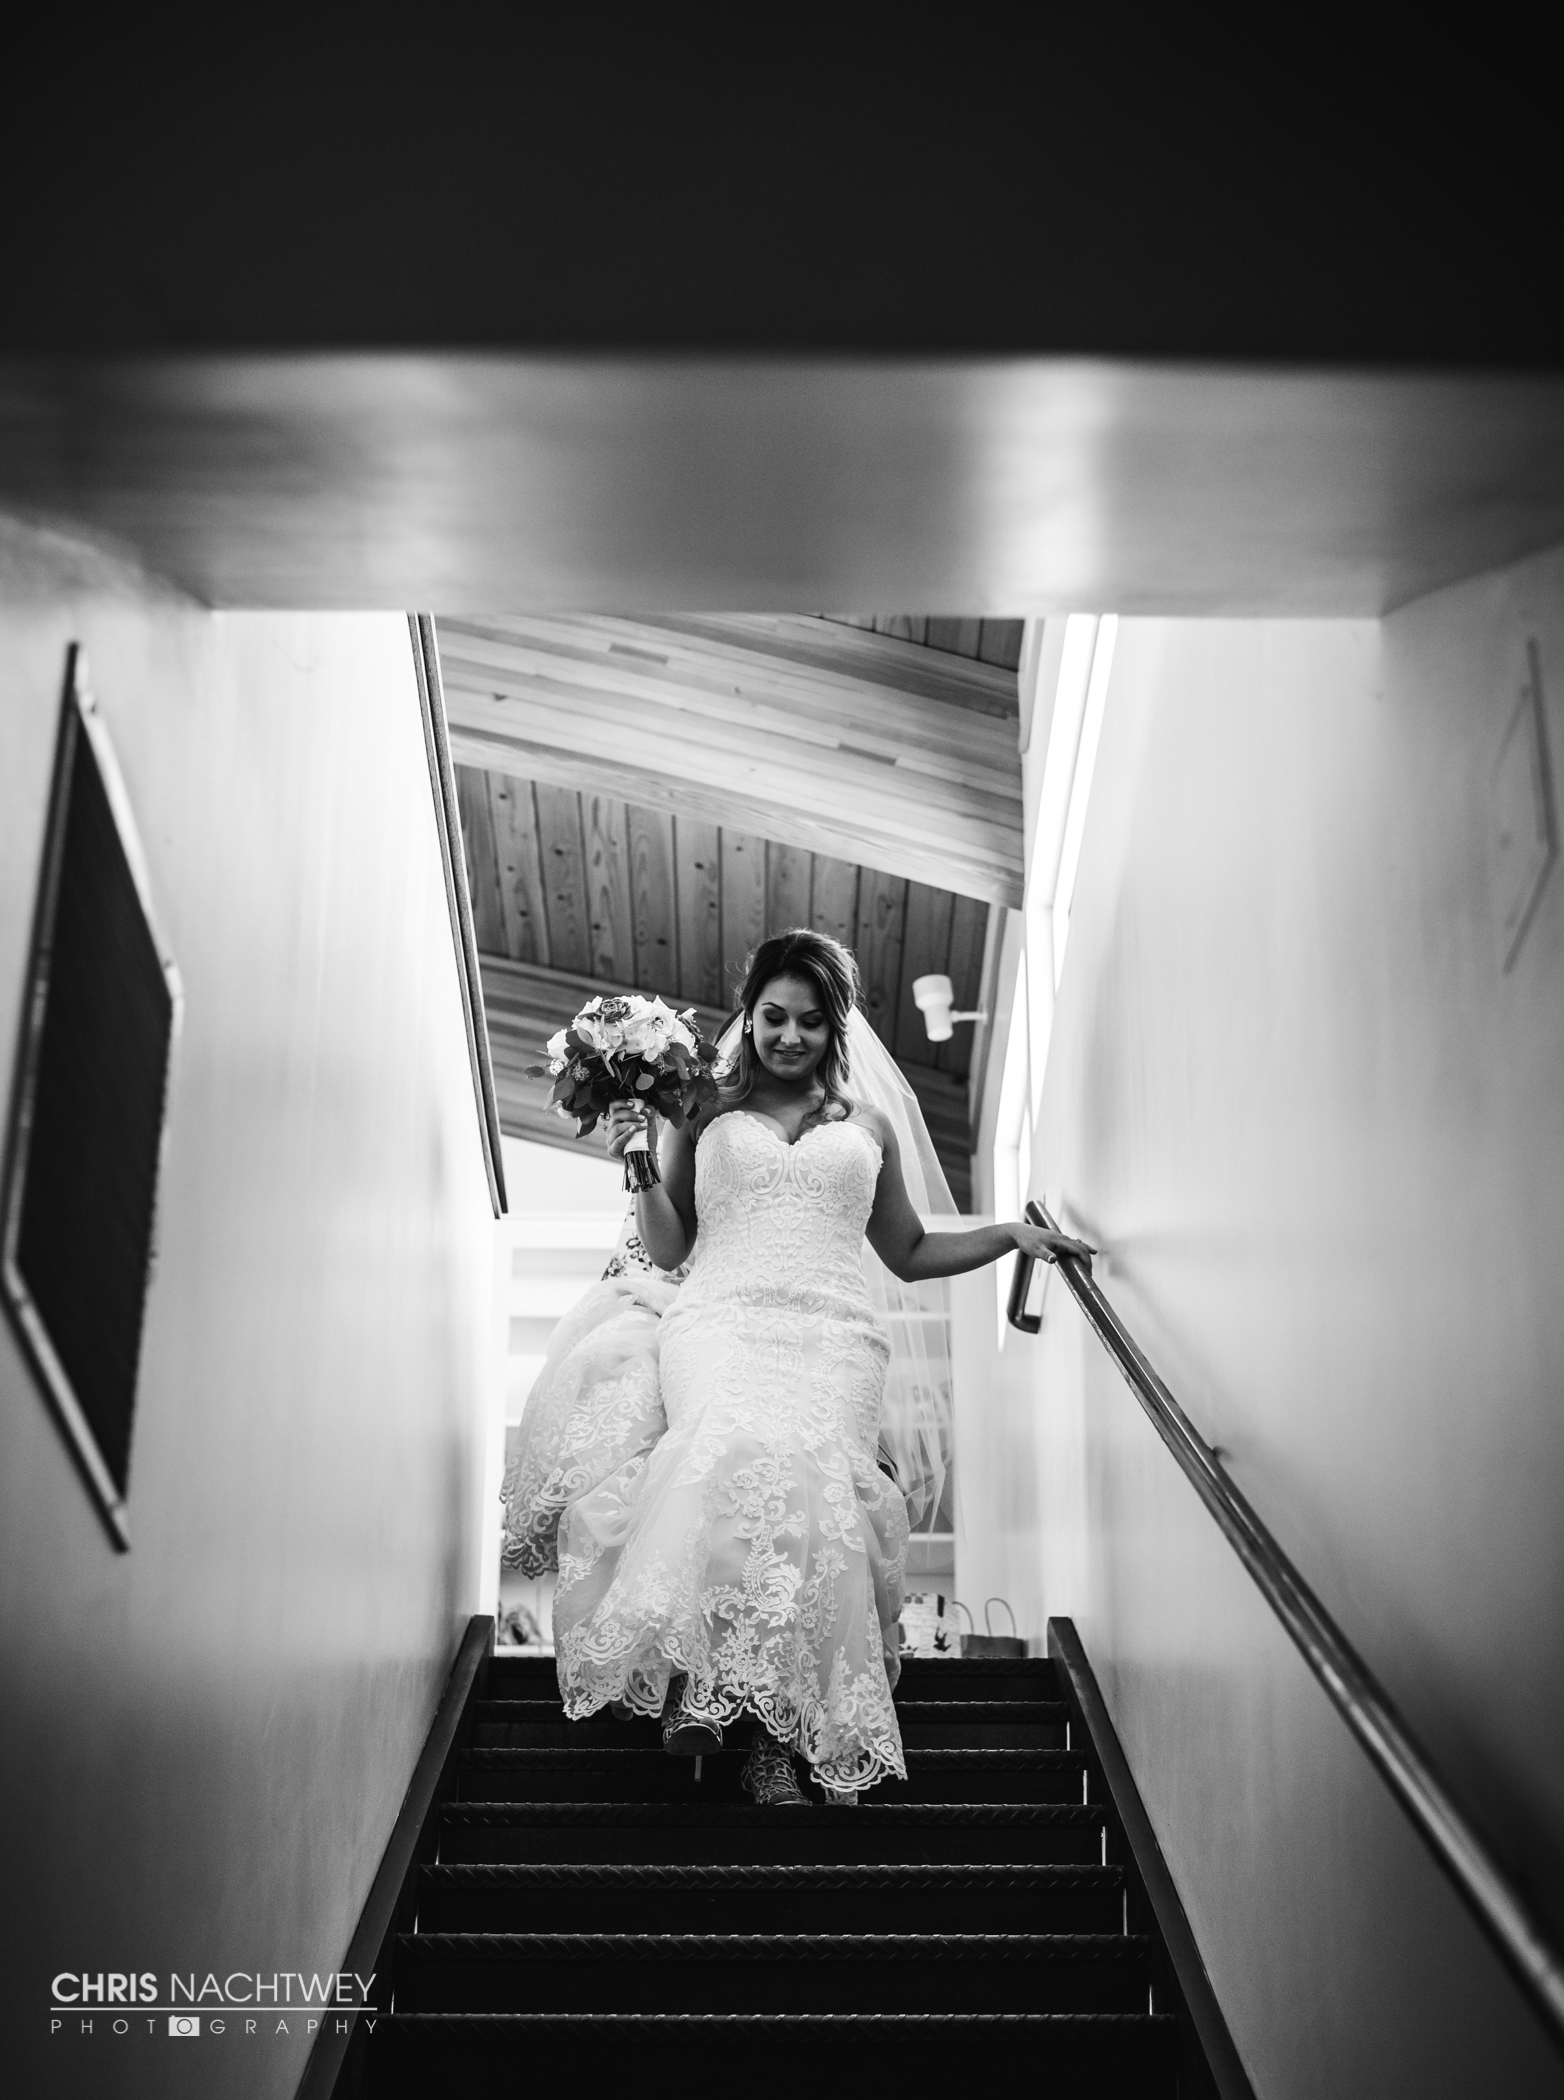 saltwater-farm-vineyard-wedding-photos-lindsay-gabe-chris-nachtwey-photography-2017-18.jpg